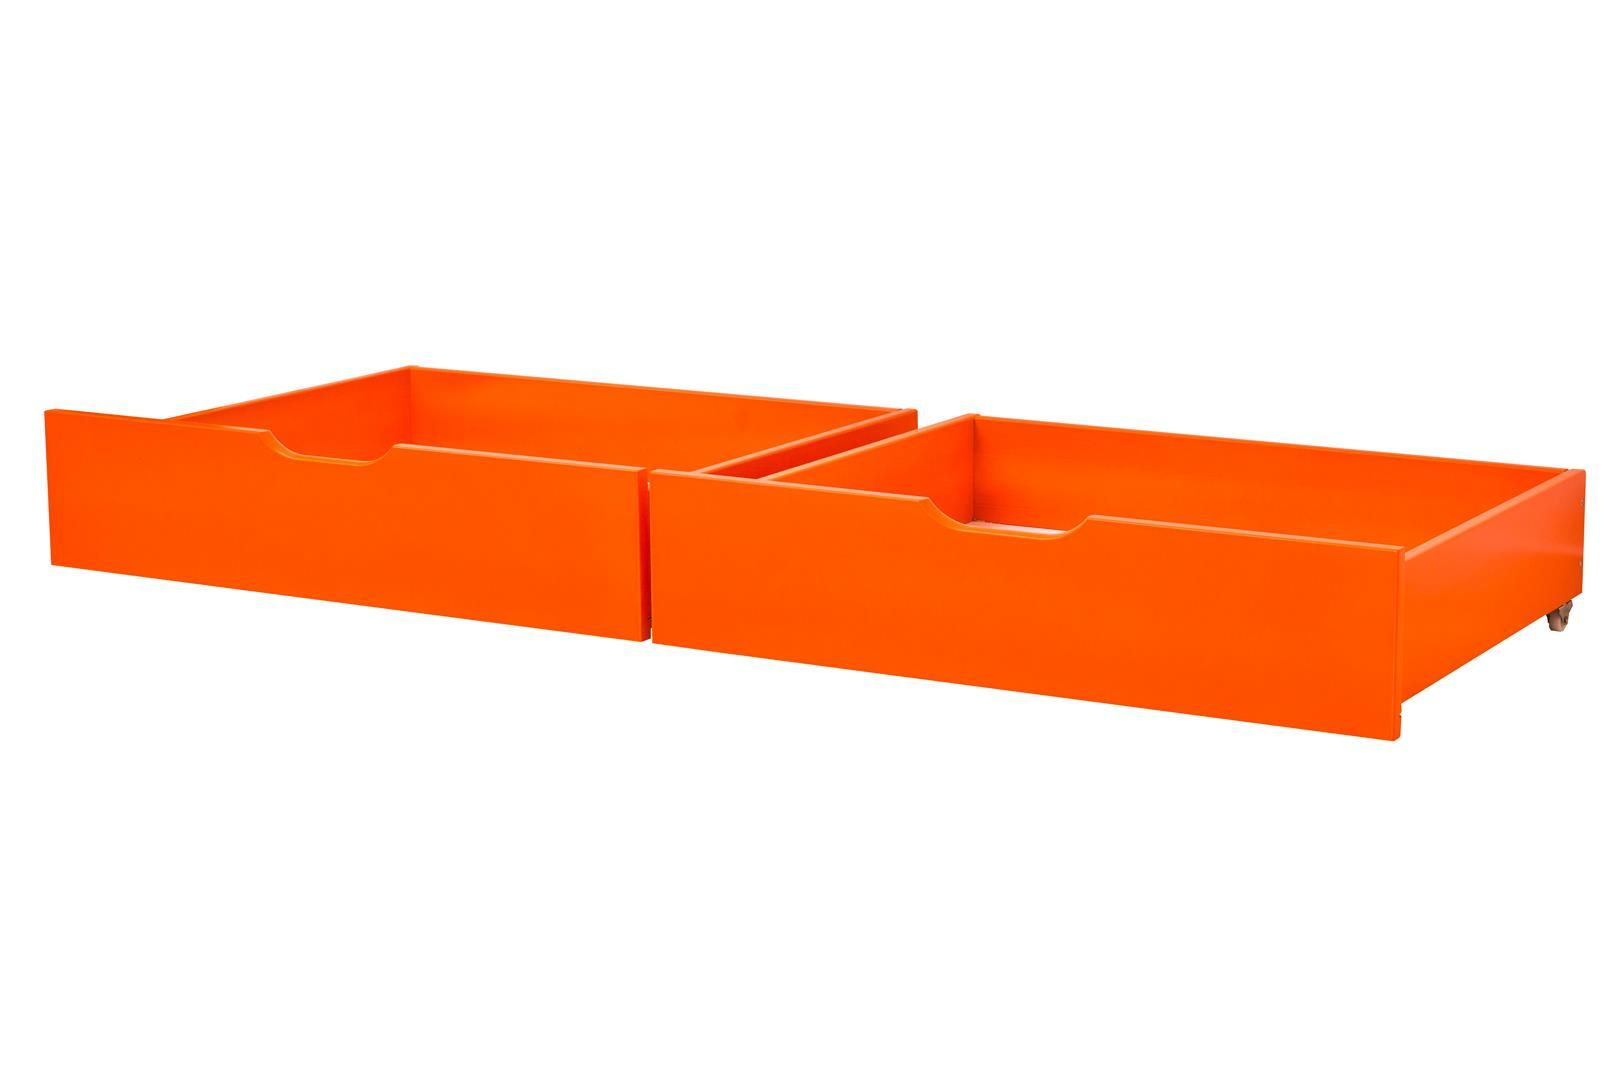 Sengeskuffesæt fra Hoppekids - Orange (153x60)